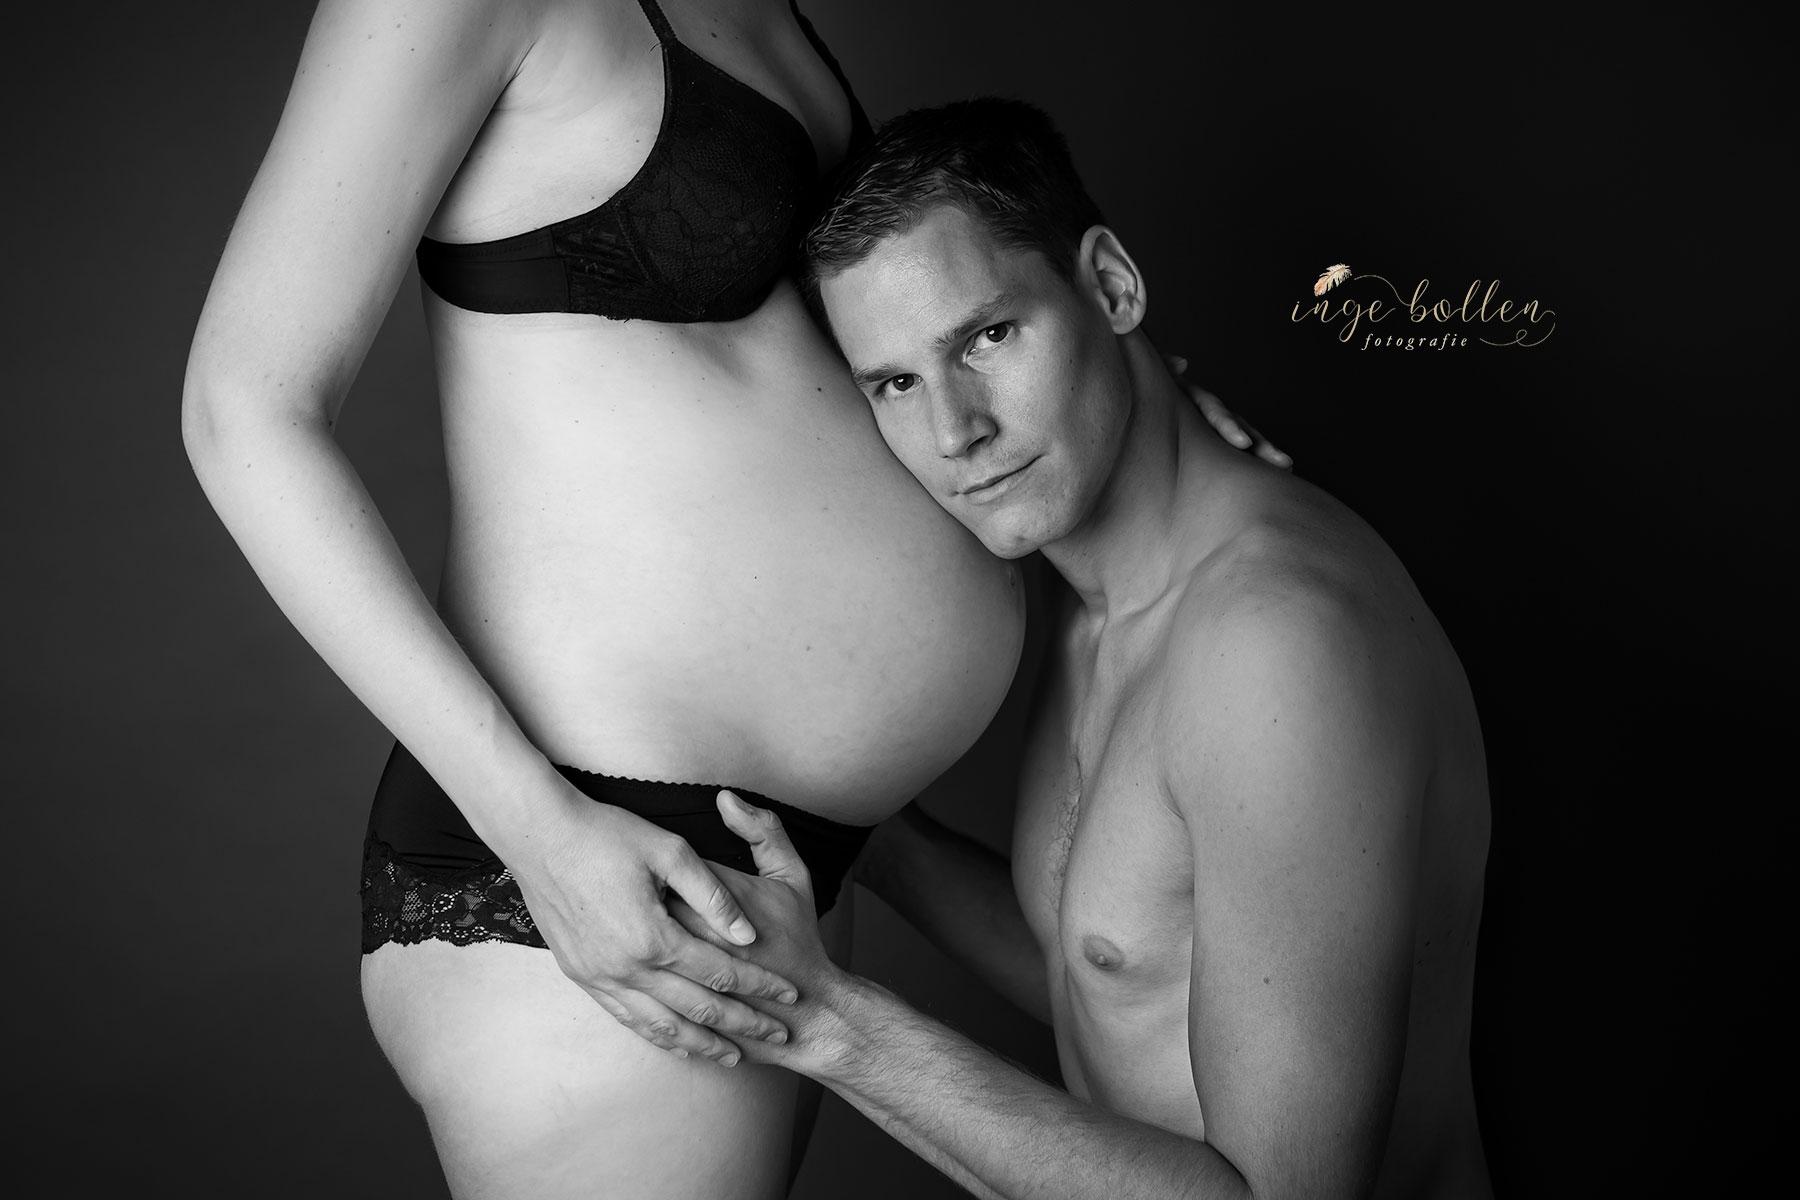 Zwangerschapsfotografie Inge Bollen